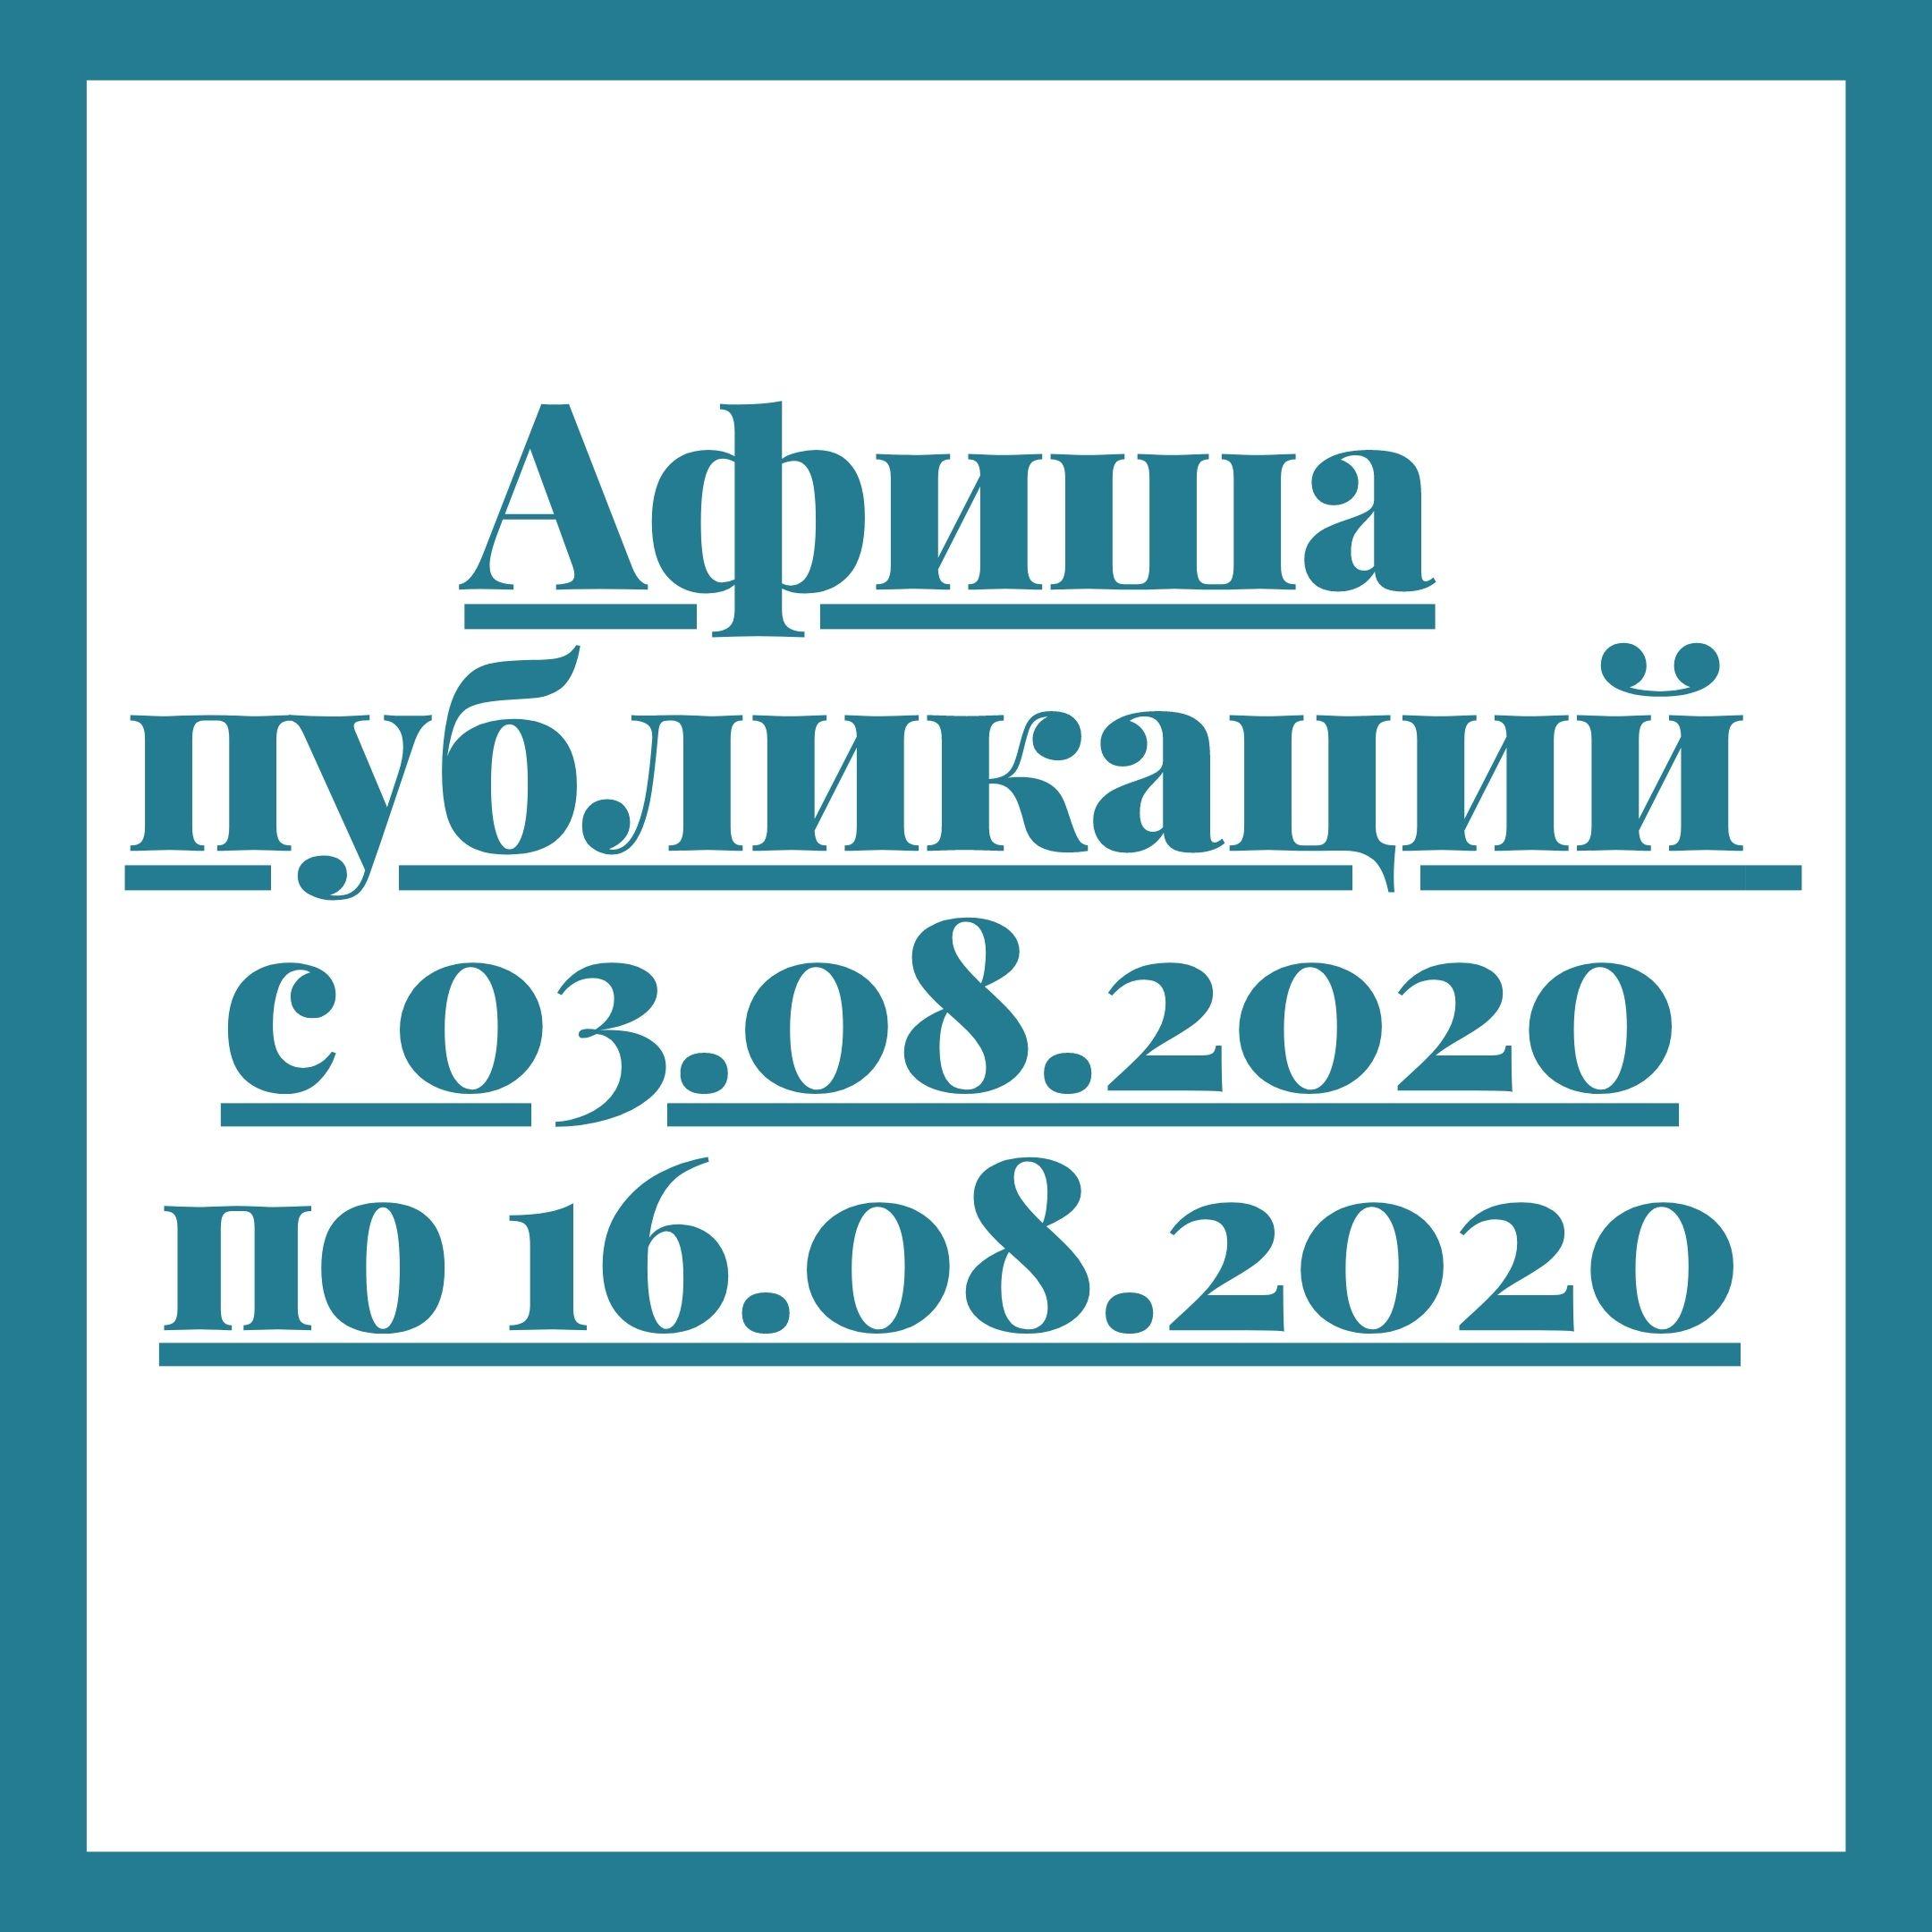 Афиша с 03.08.2020 по 16.08.2020 г.